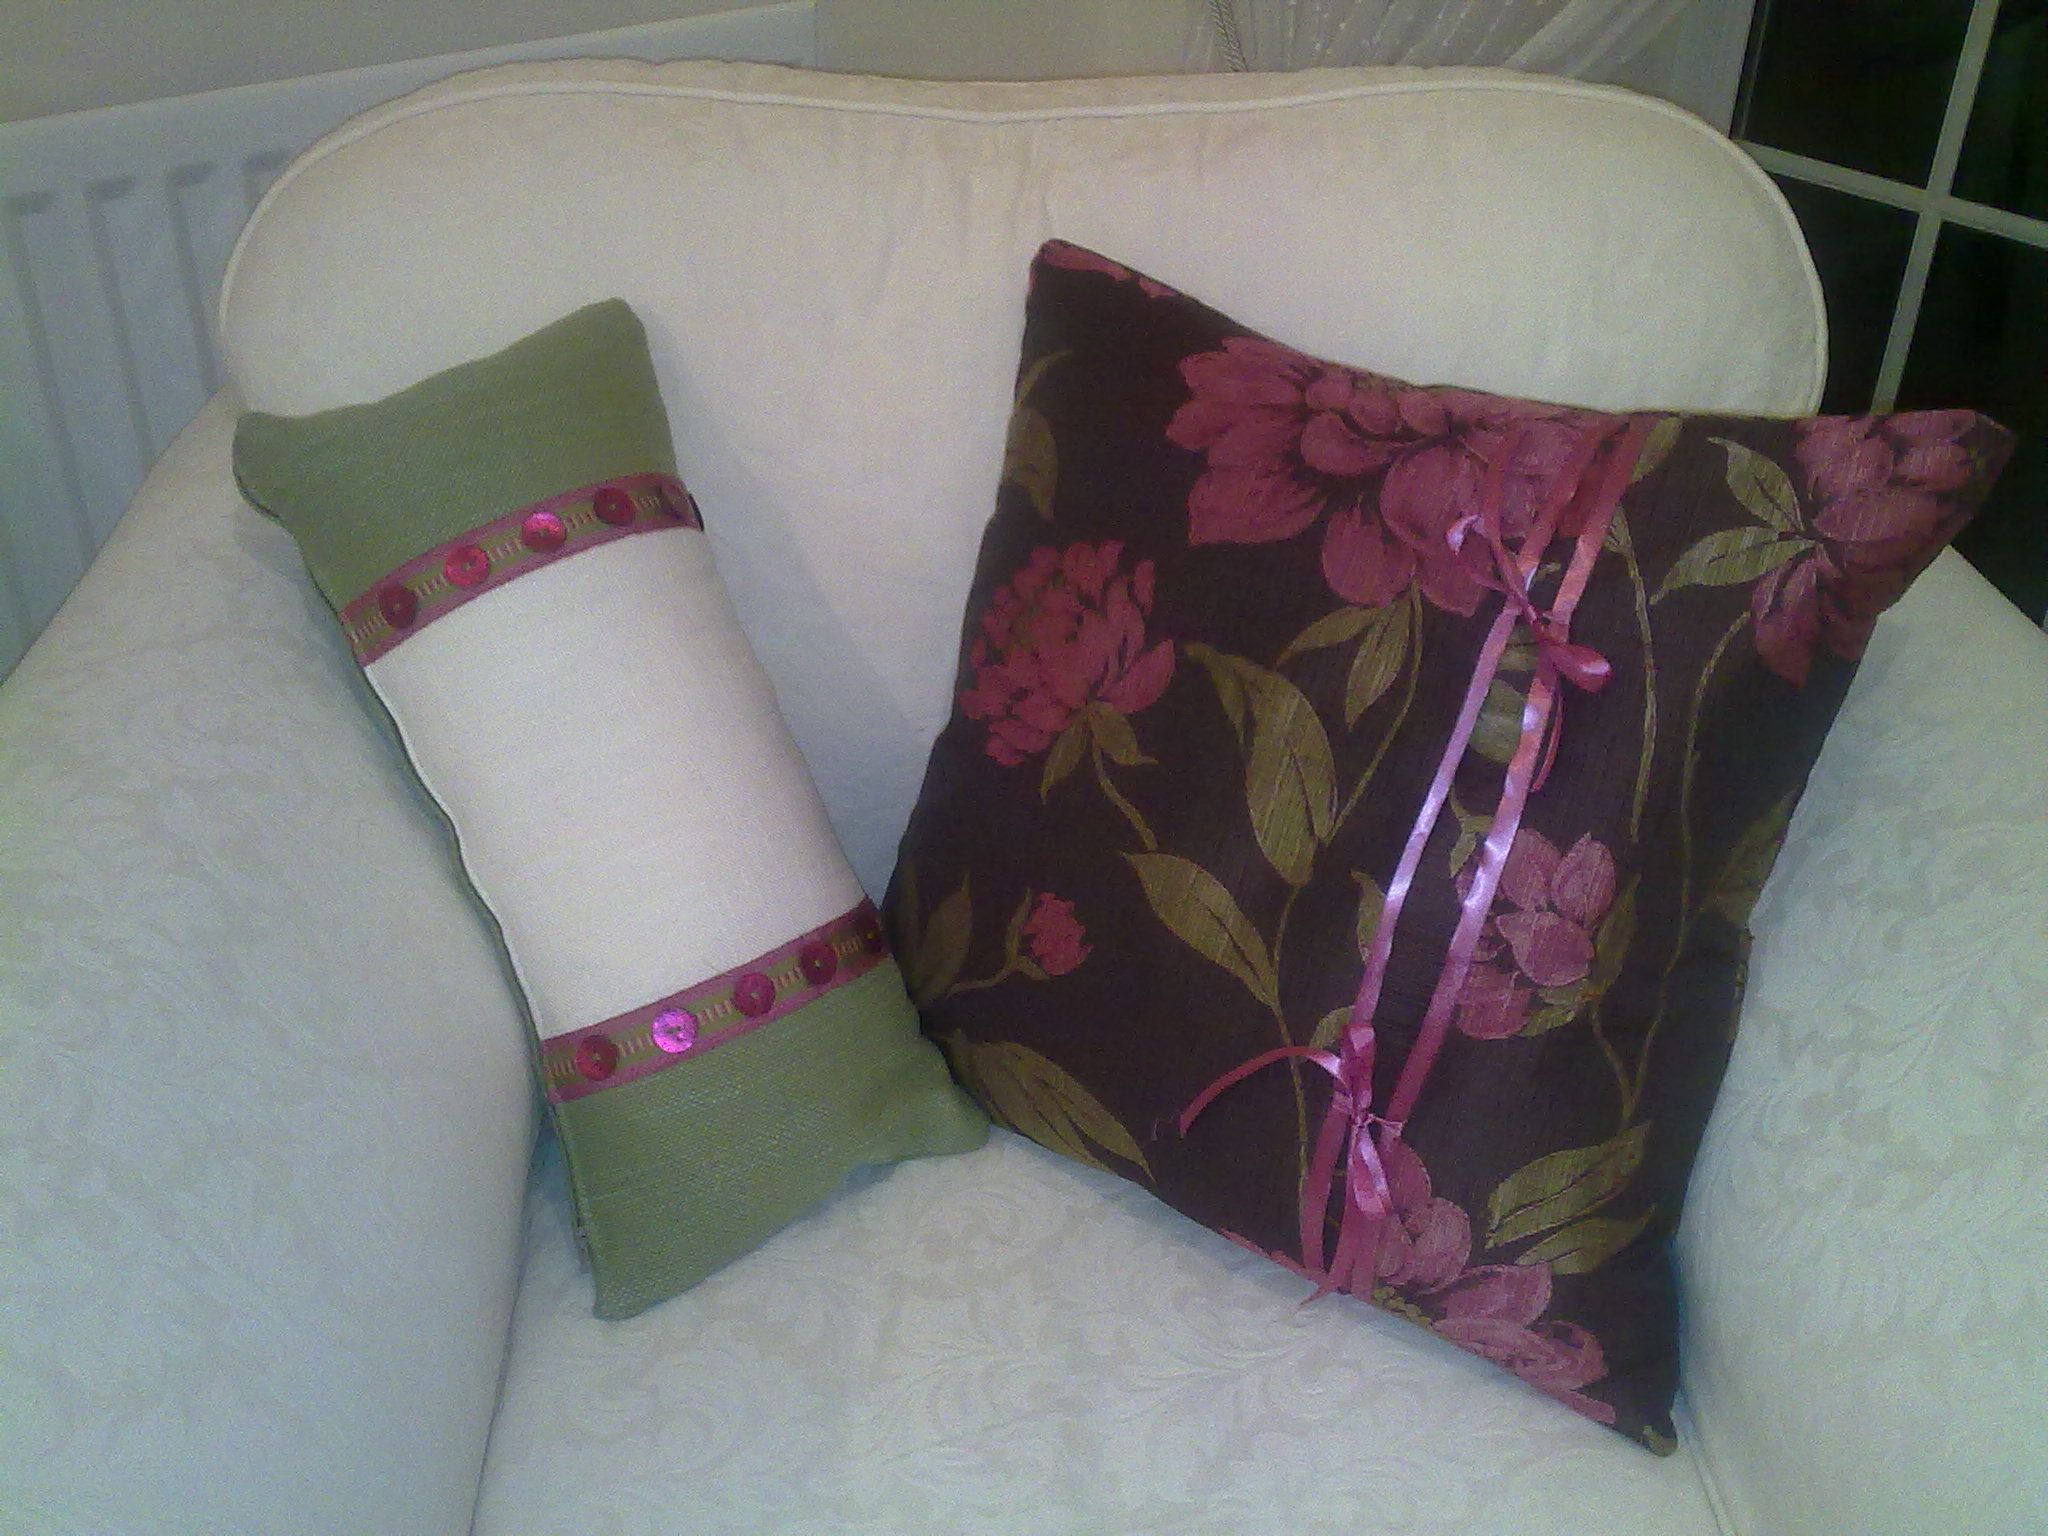 2 more cushions